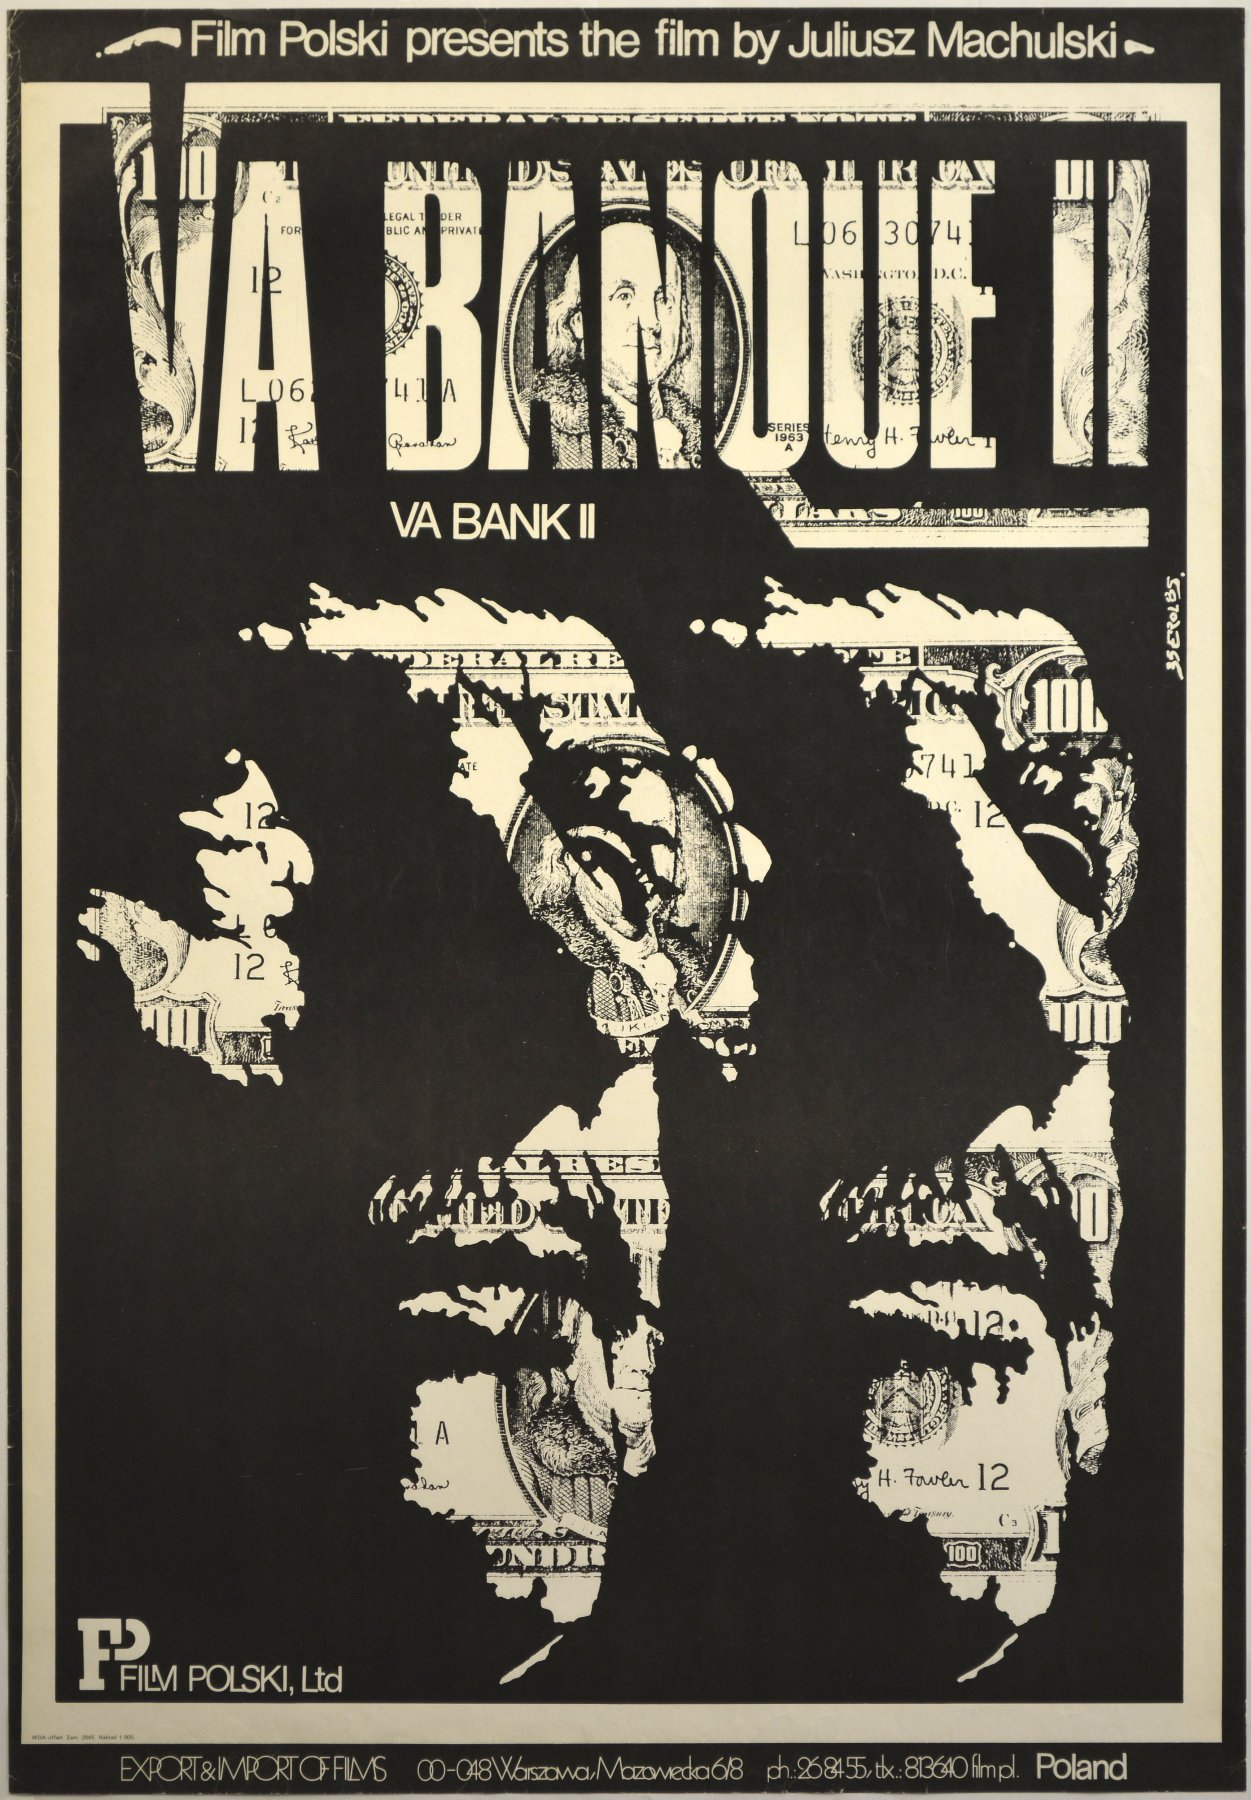 Va Banque II, 1985 r.